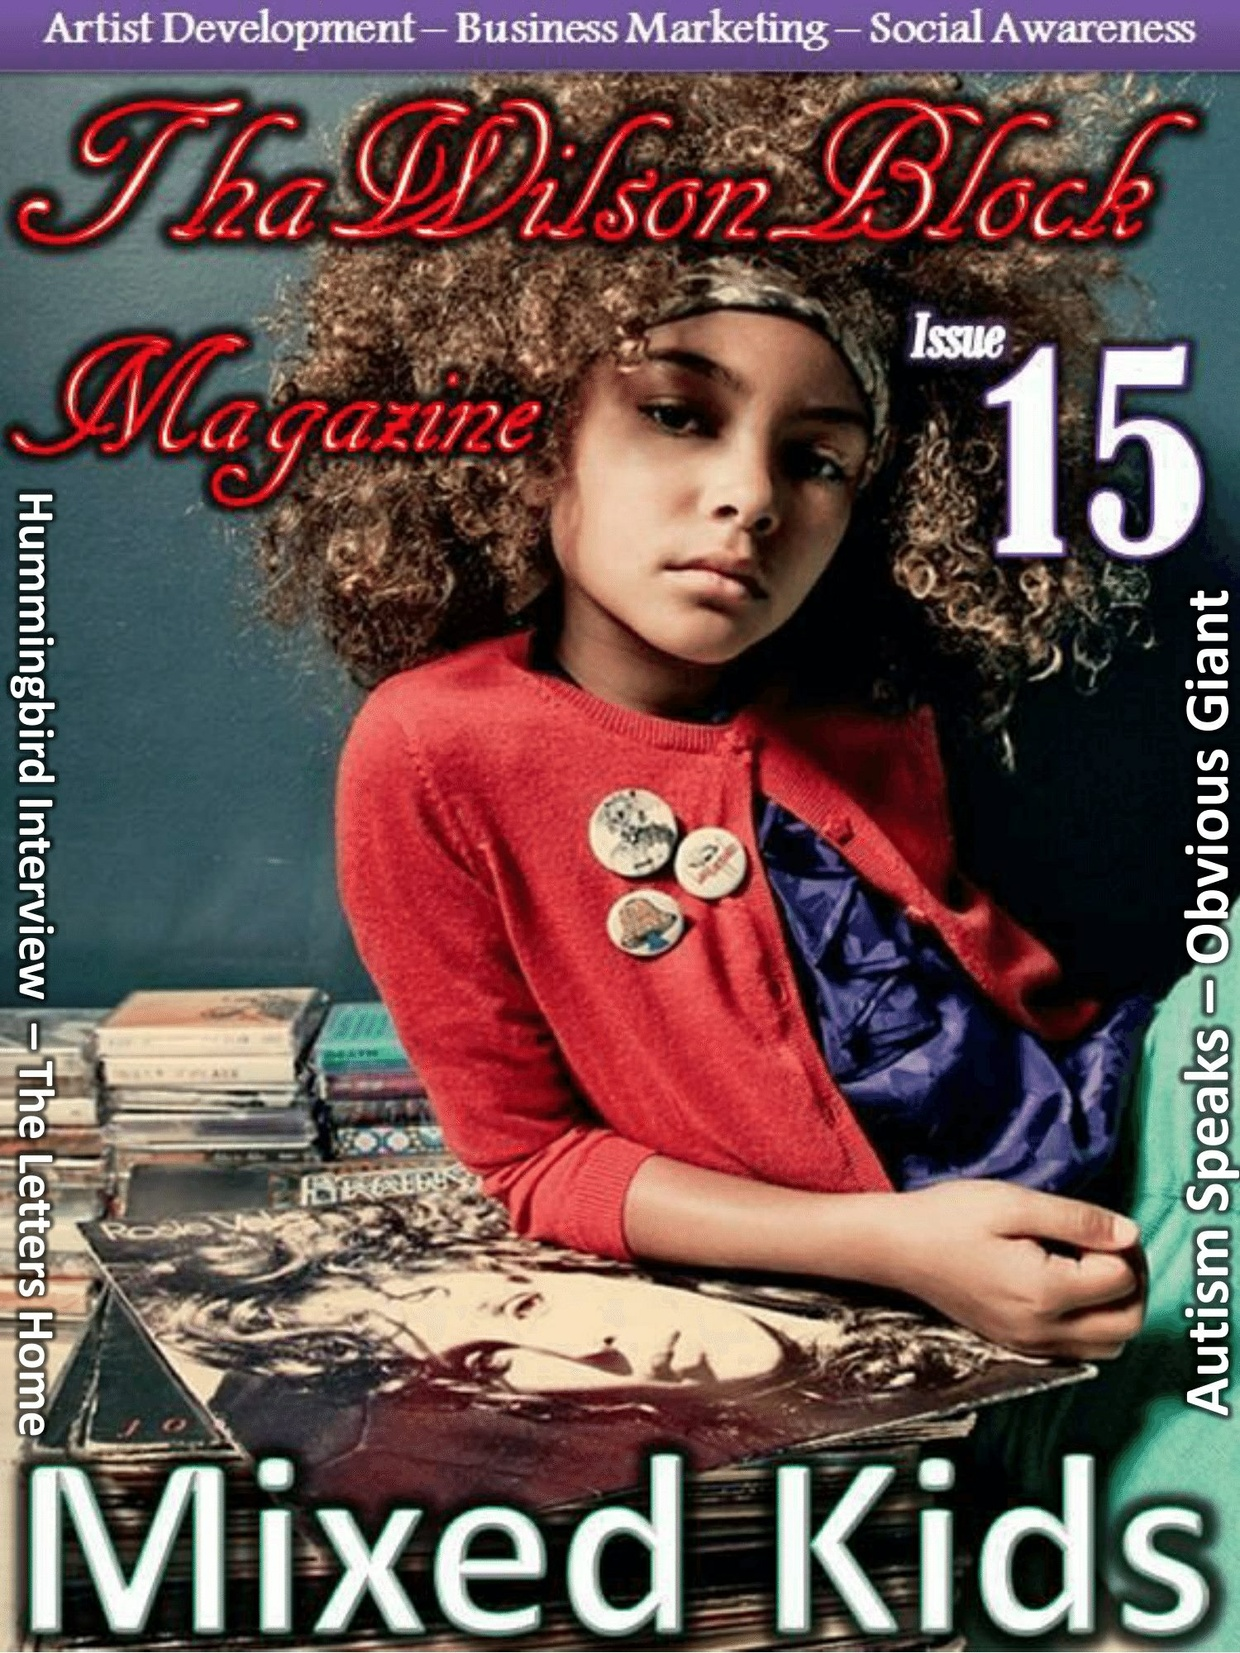 ThaWilsonBlock Magazine Issue15